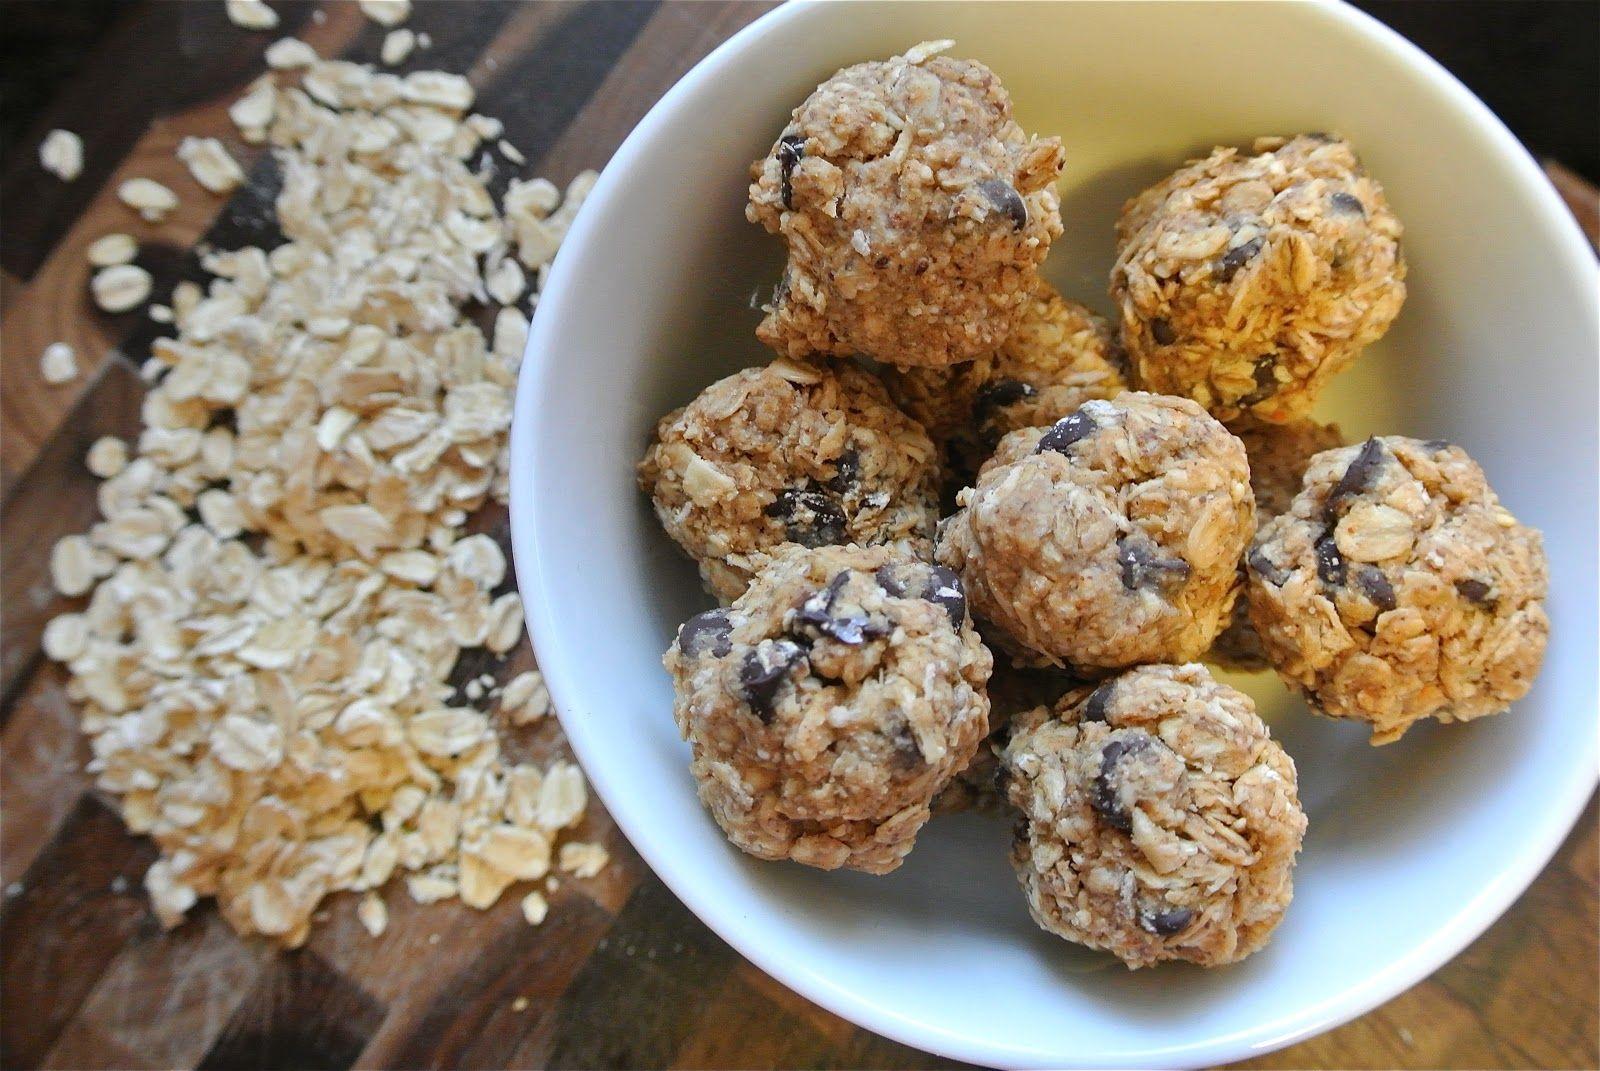 Homemade easy granola bites lowfodmaps can be